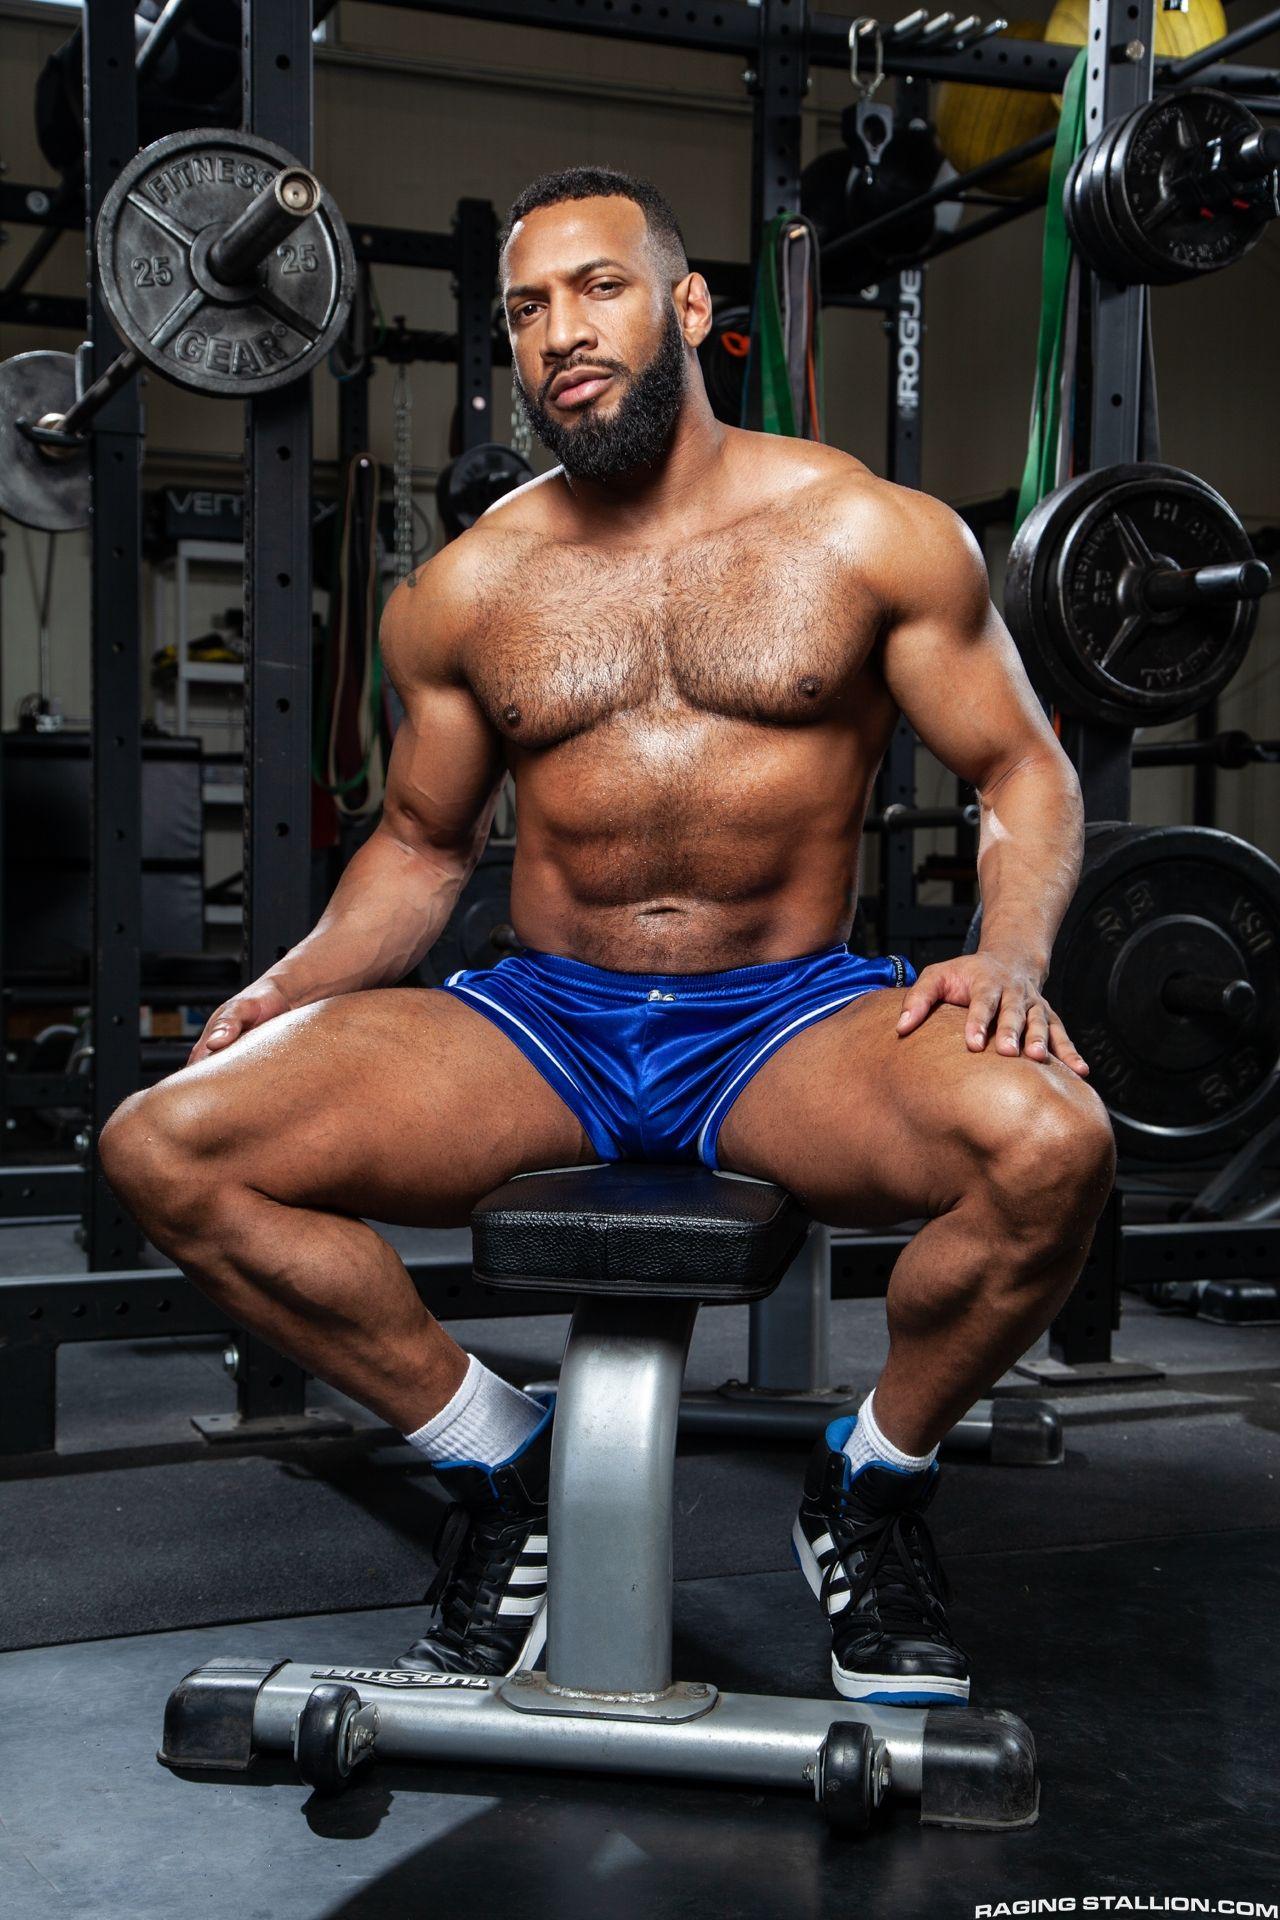 Jay Landford fuck Riley Mitchel gay hot daddy dude men porn bear Do Me For The Likes